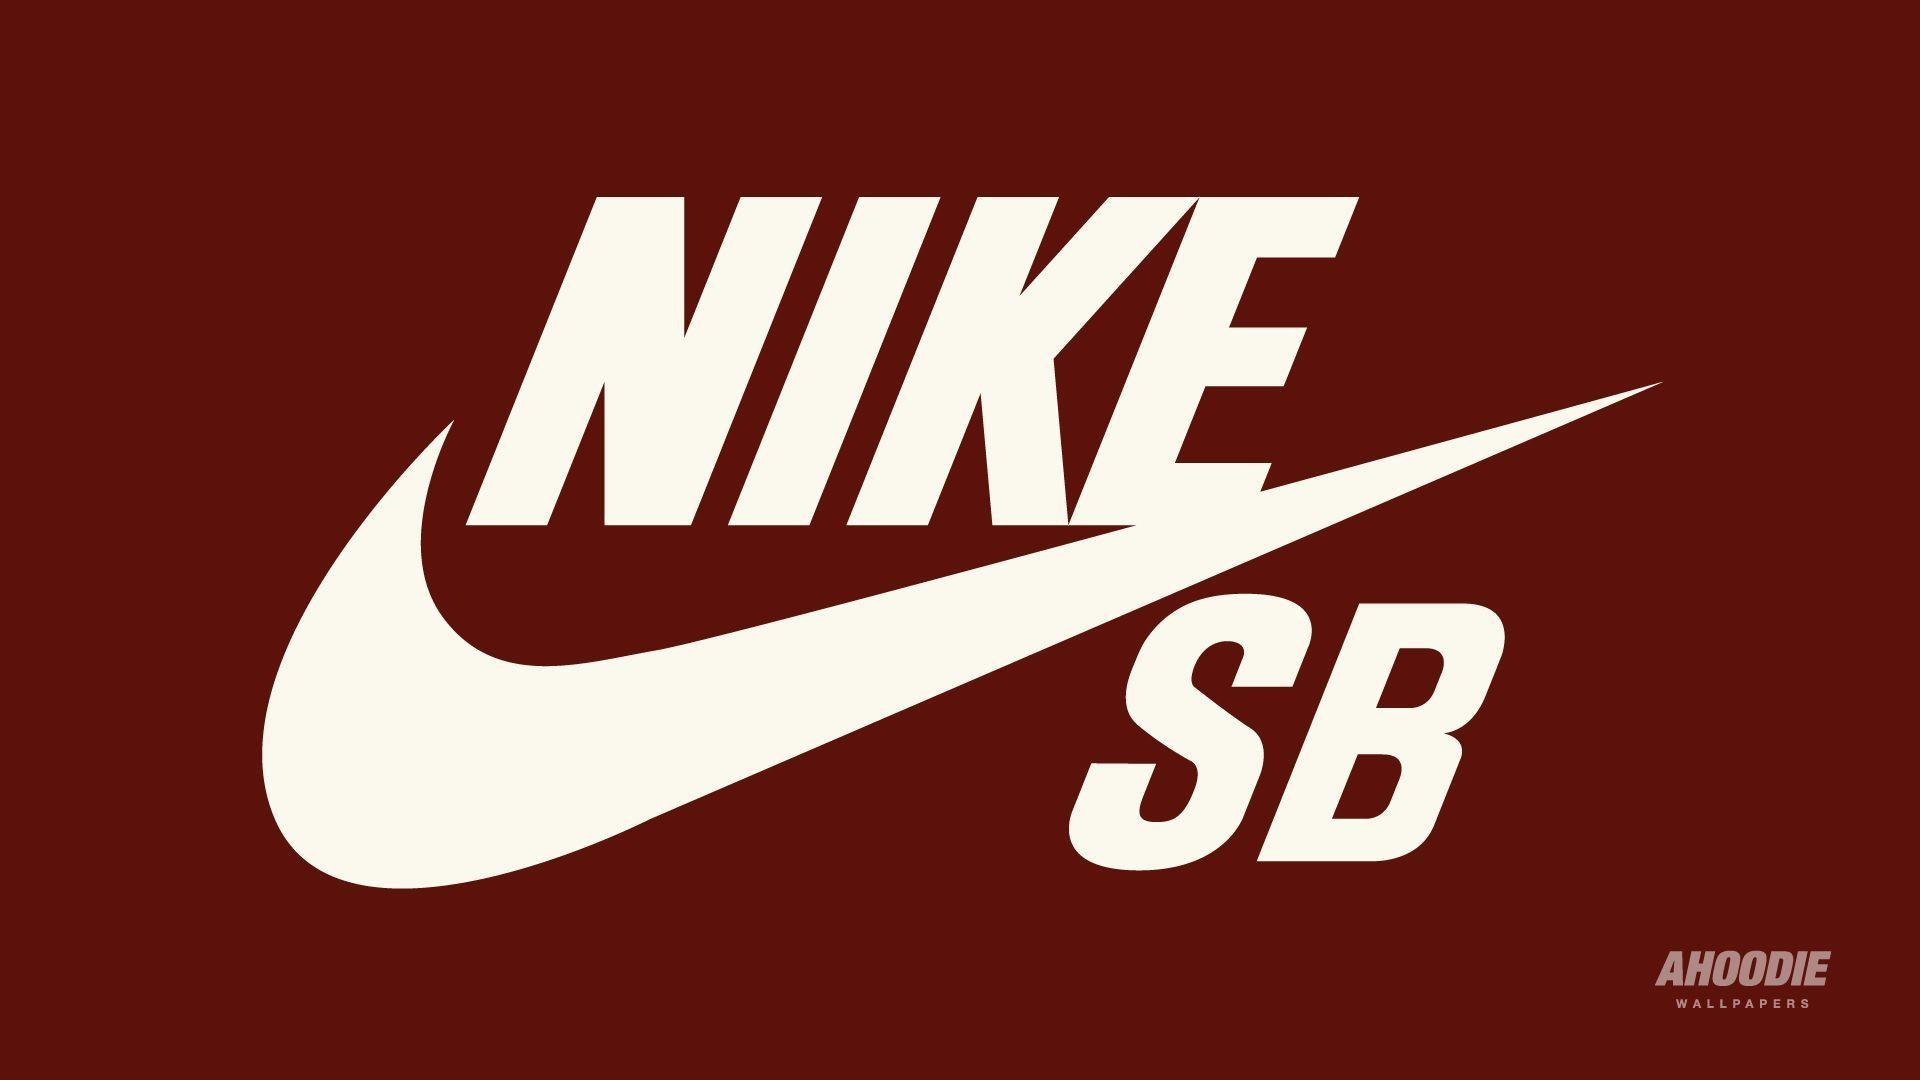 Nike sb wallpaper 55 images - Fantasy nike wallpaper ...